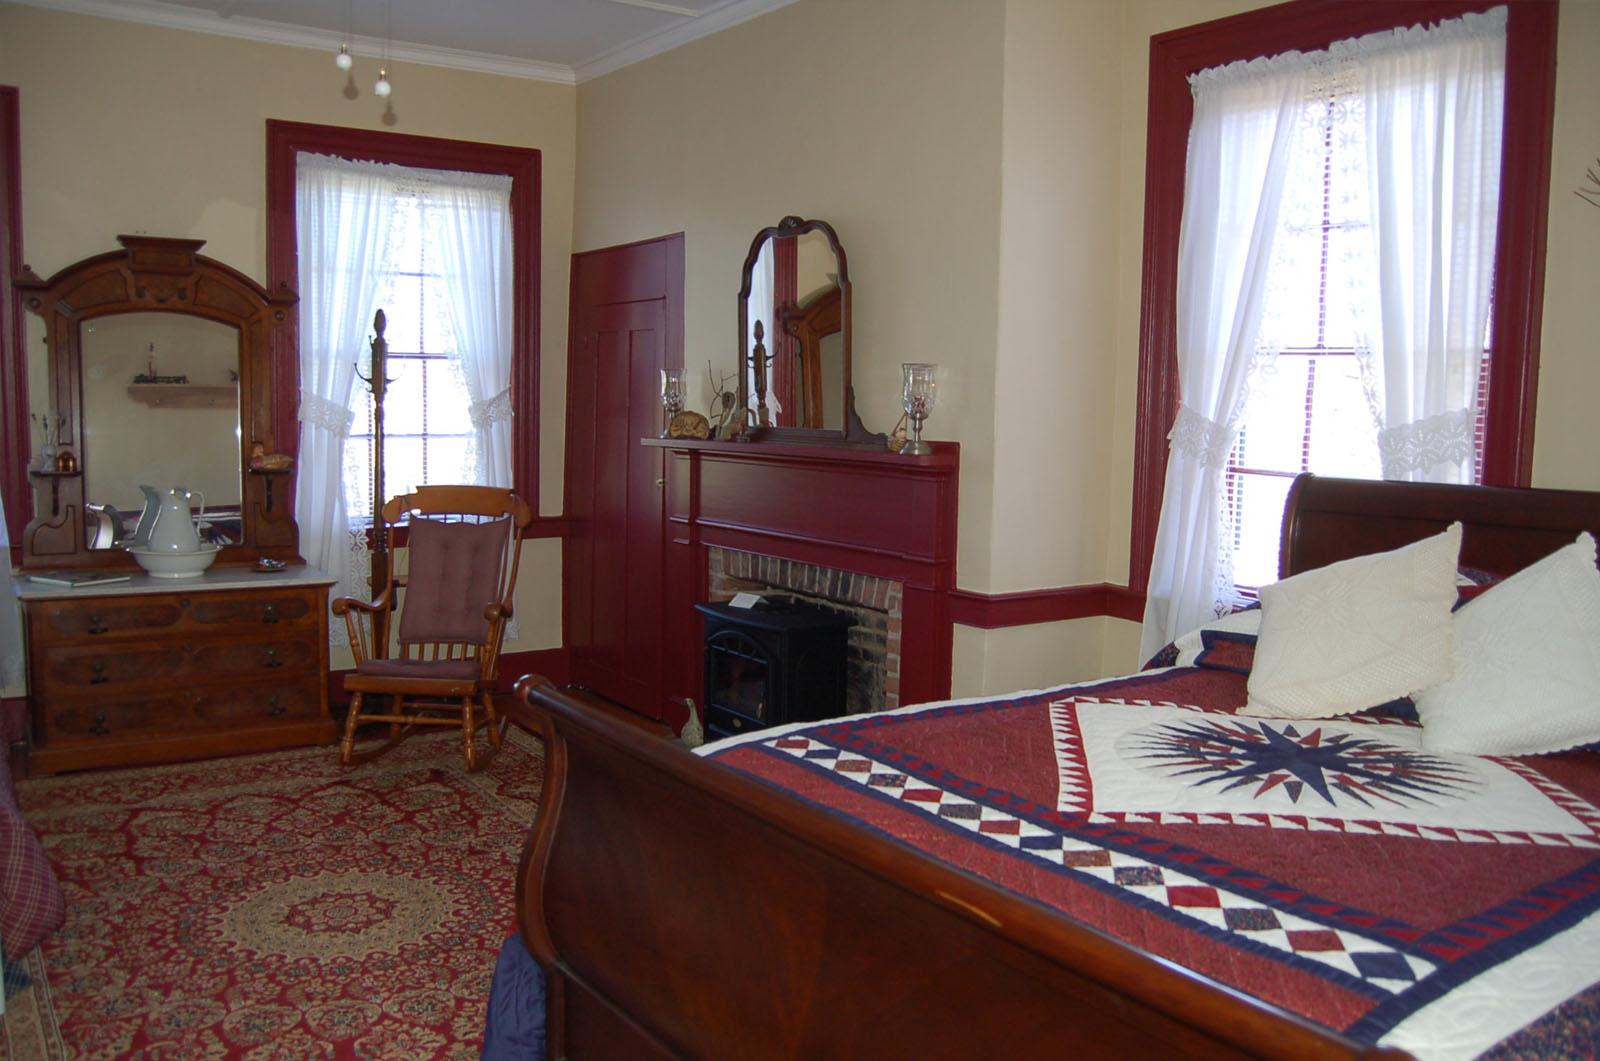 Wayne Room, James Manning B&B, Honesdale, PA